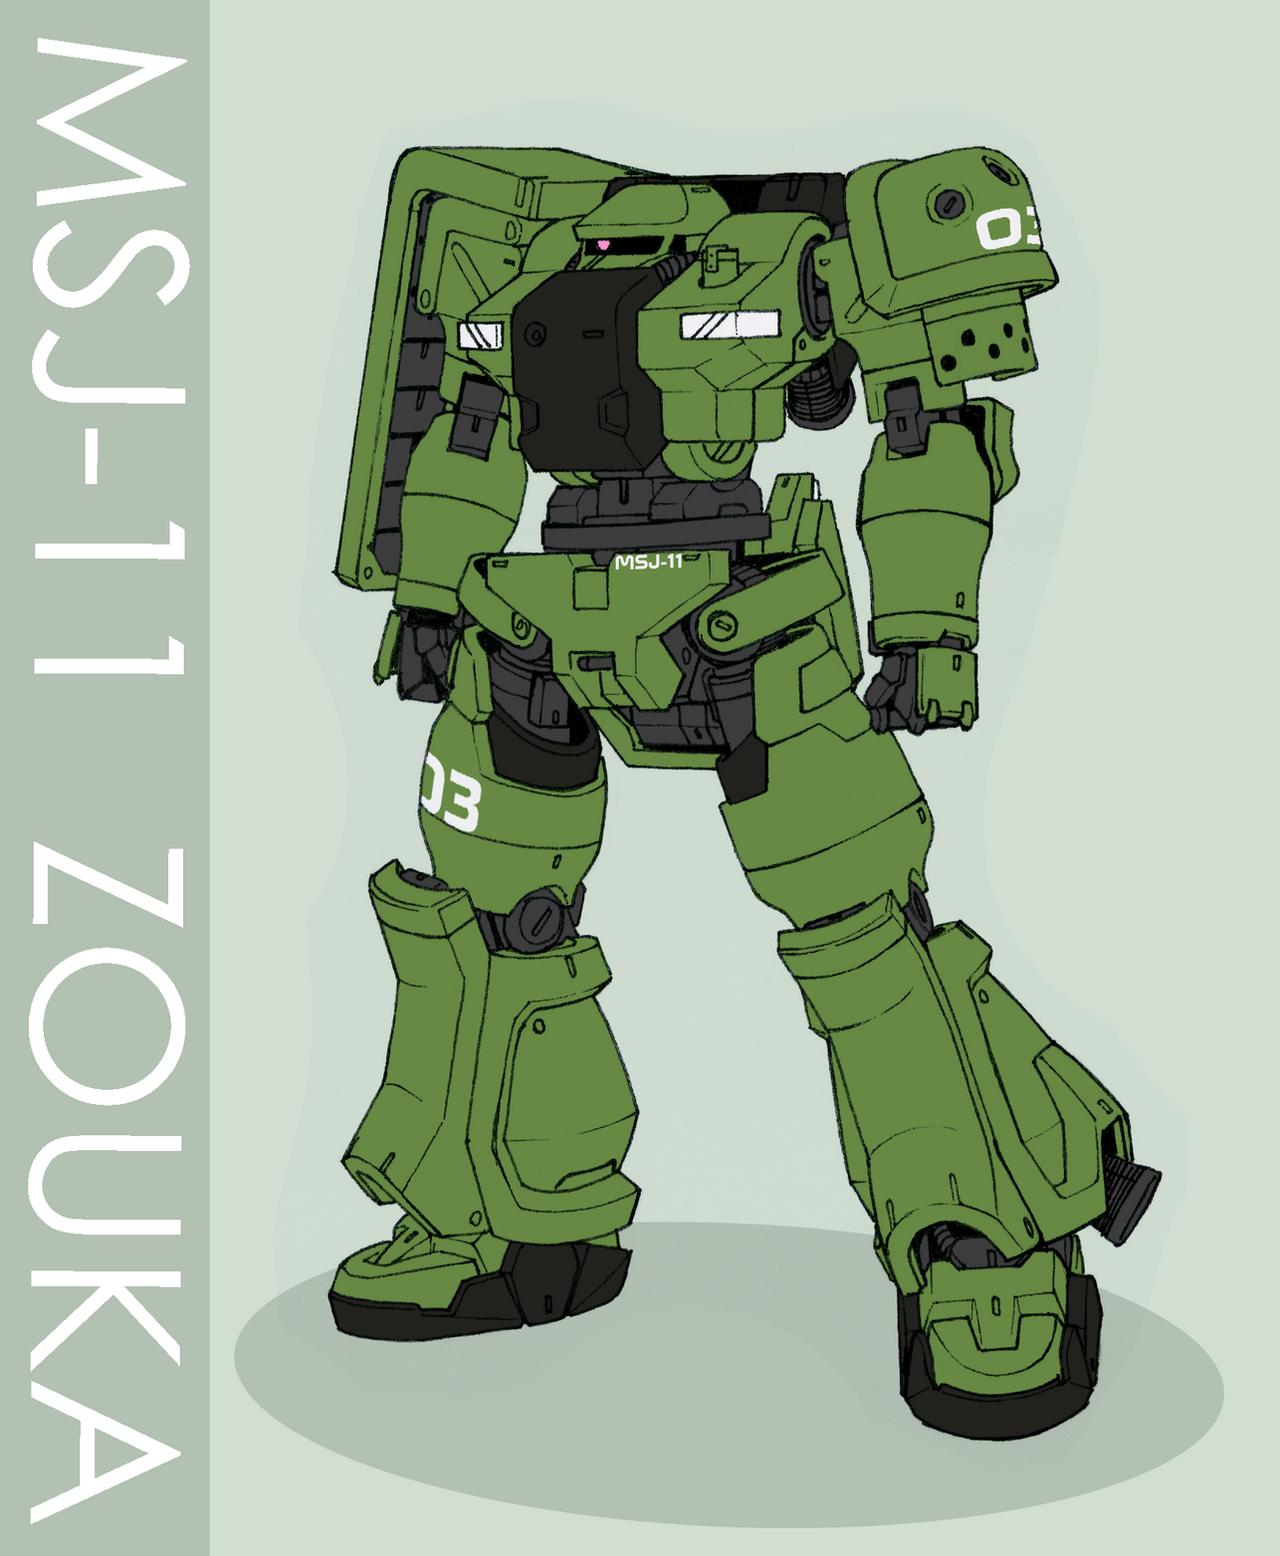 MSJ-11 Zouka by Tekka-Croe